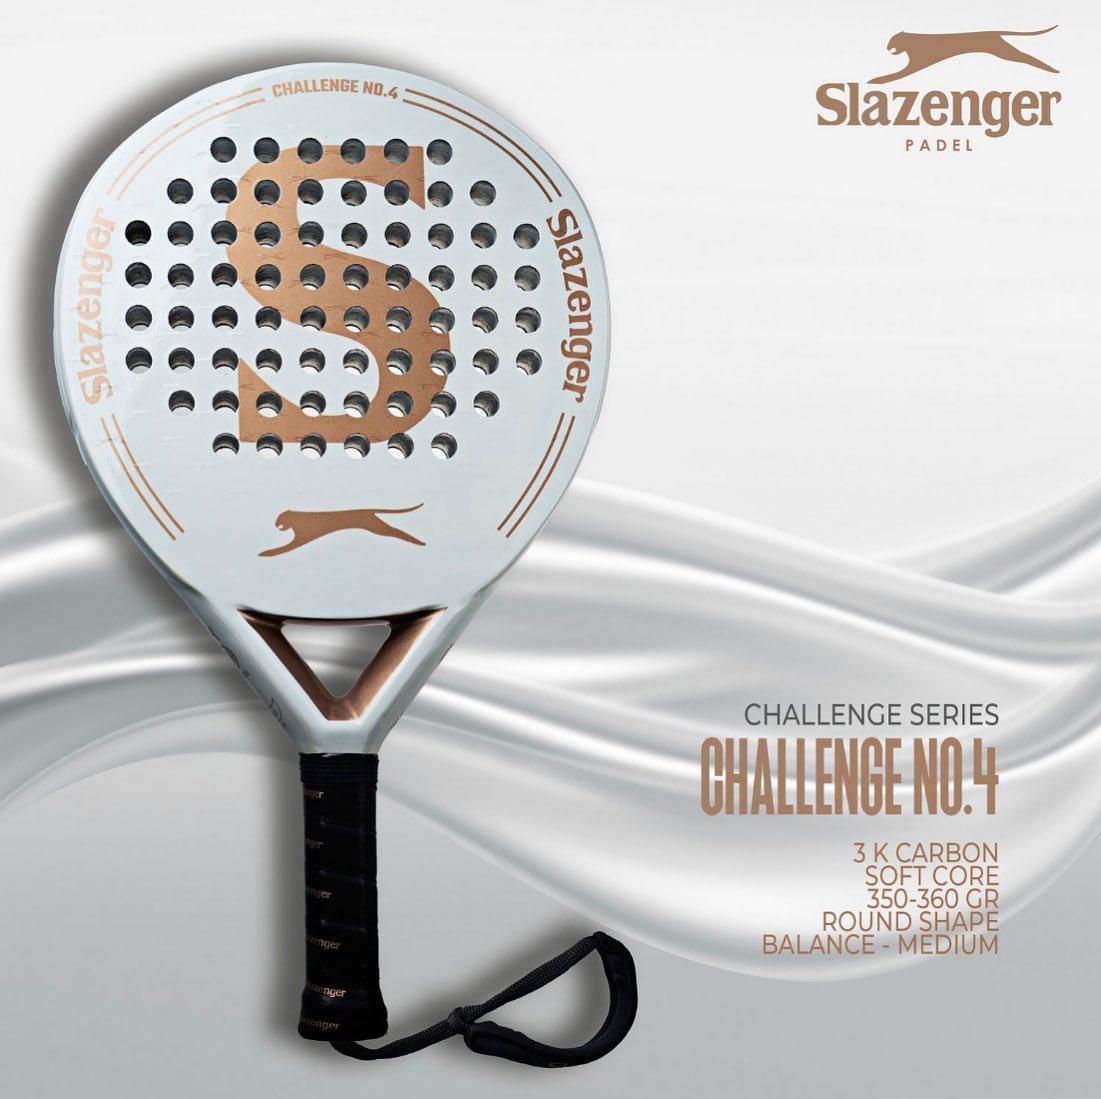 Slazenger padel 2021 Challenge No.4